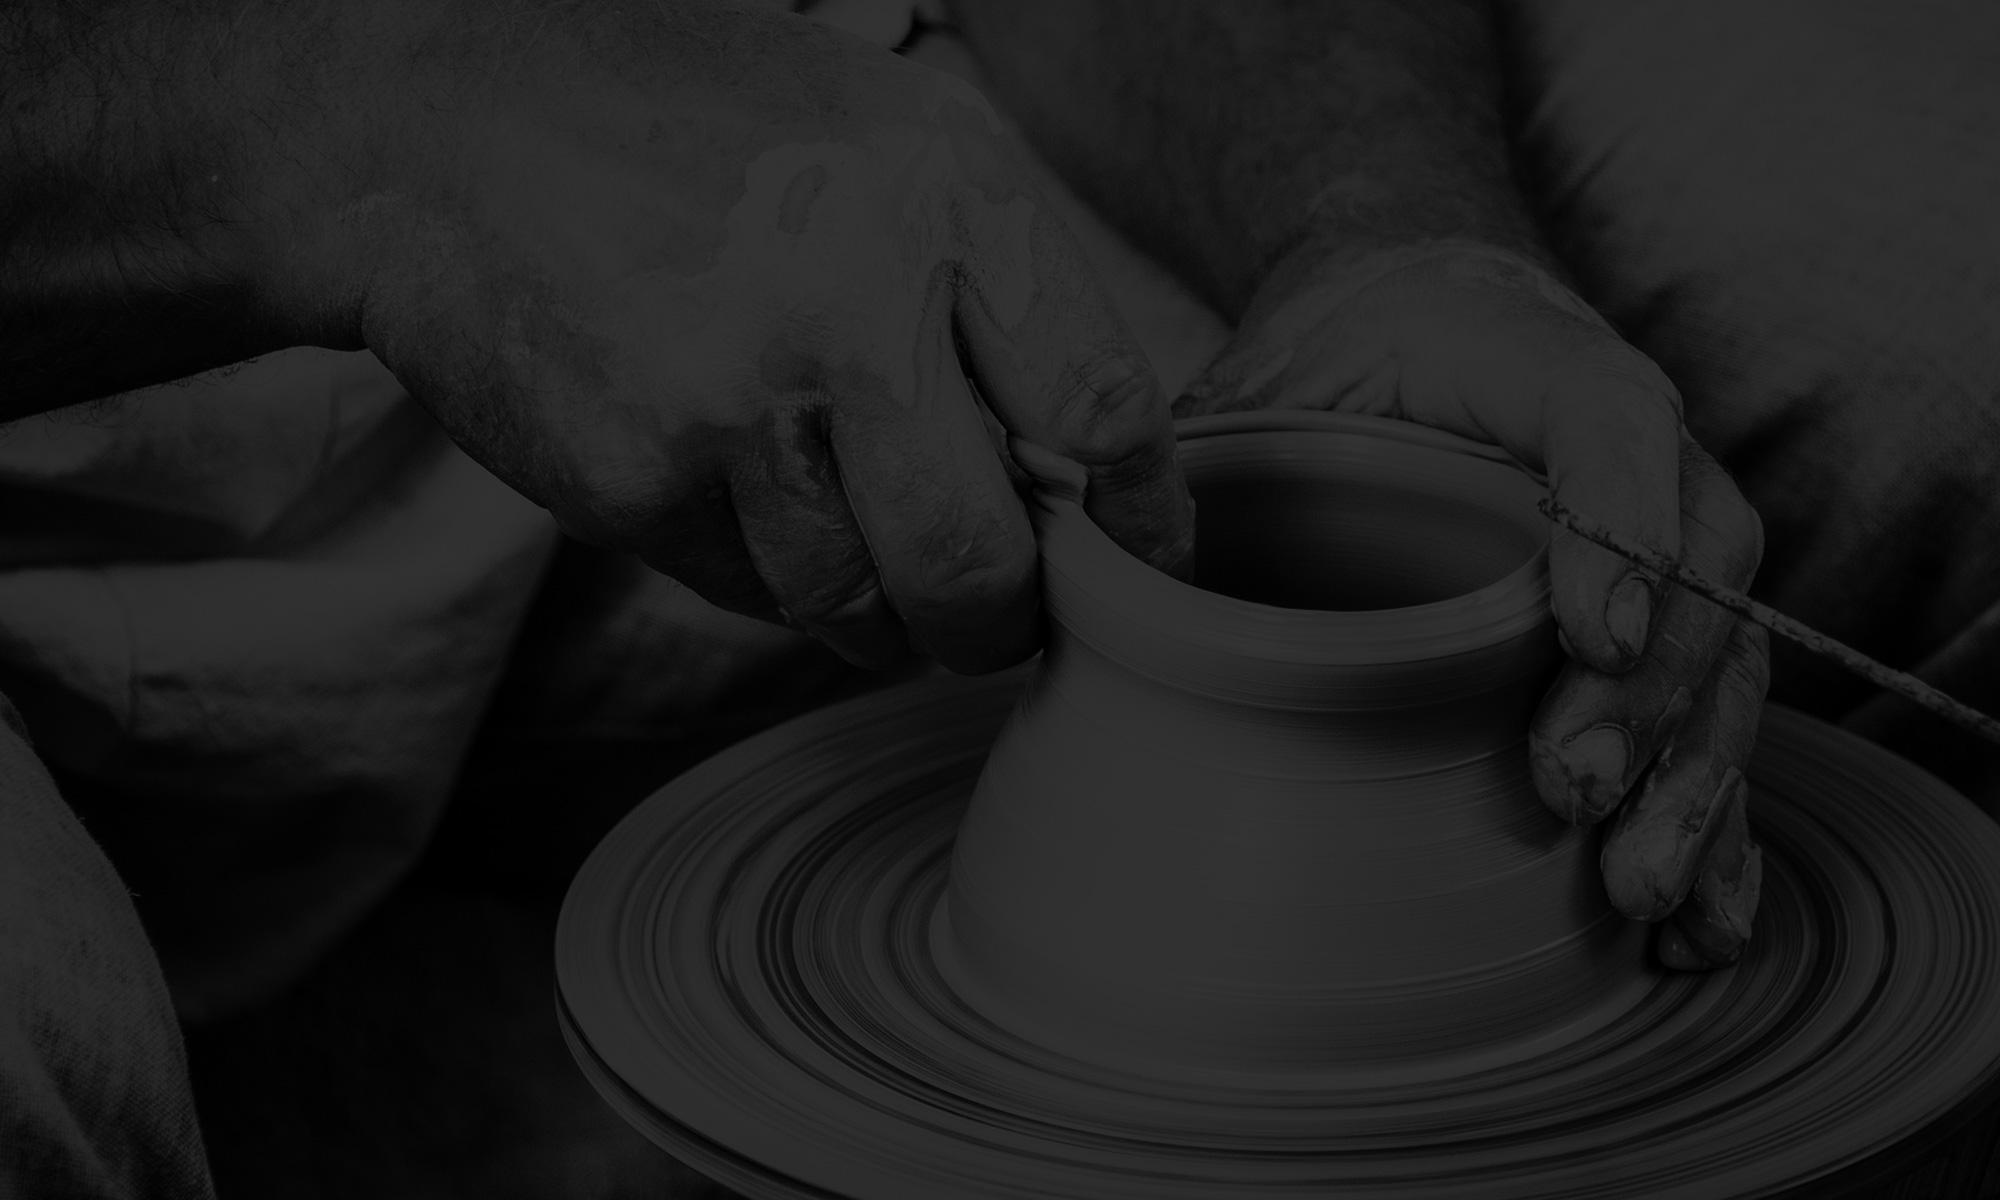 passaggi-ad-arte-slide-laboratori-ceramica